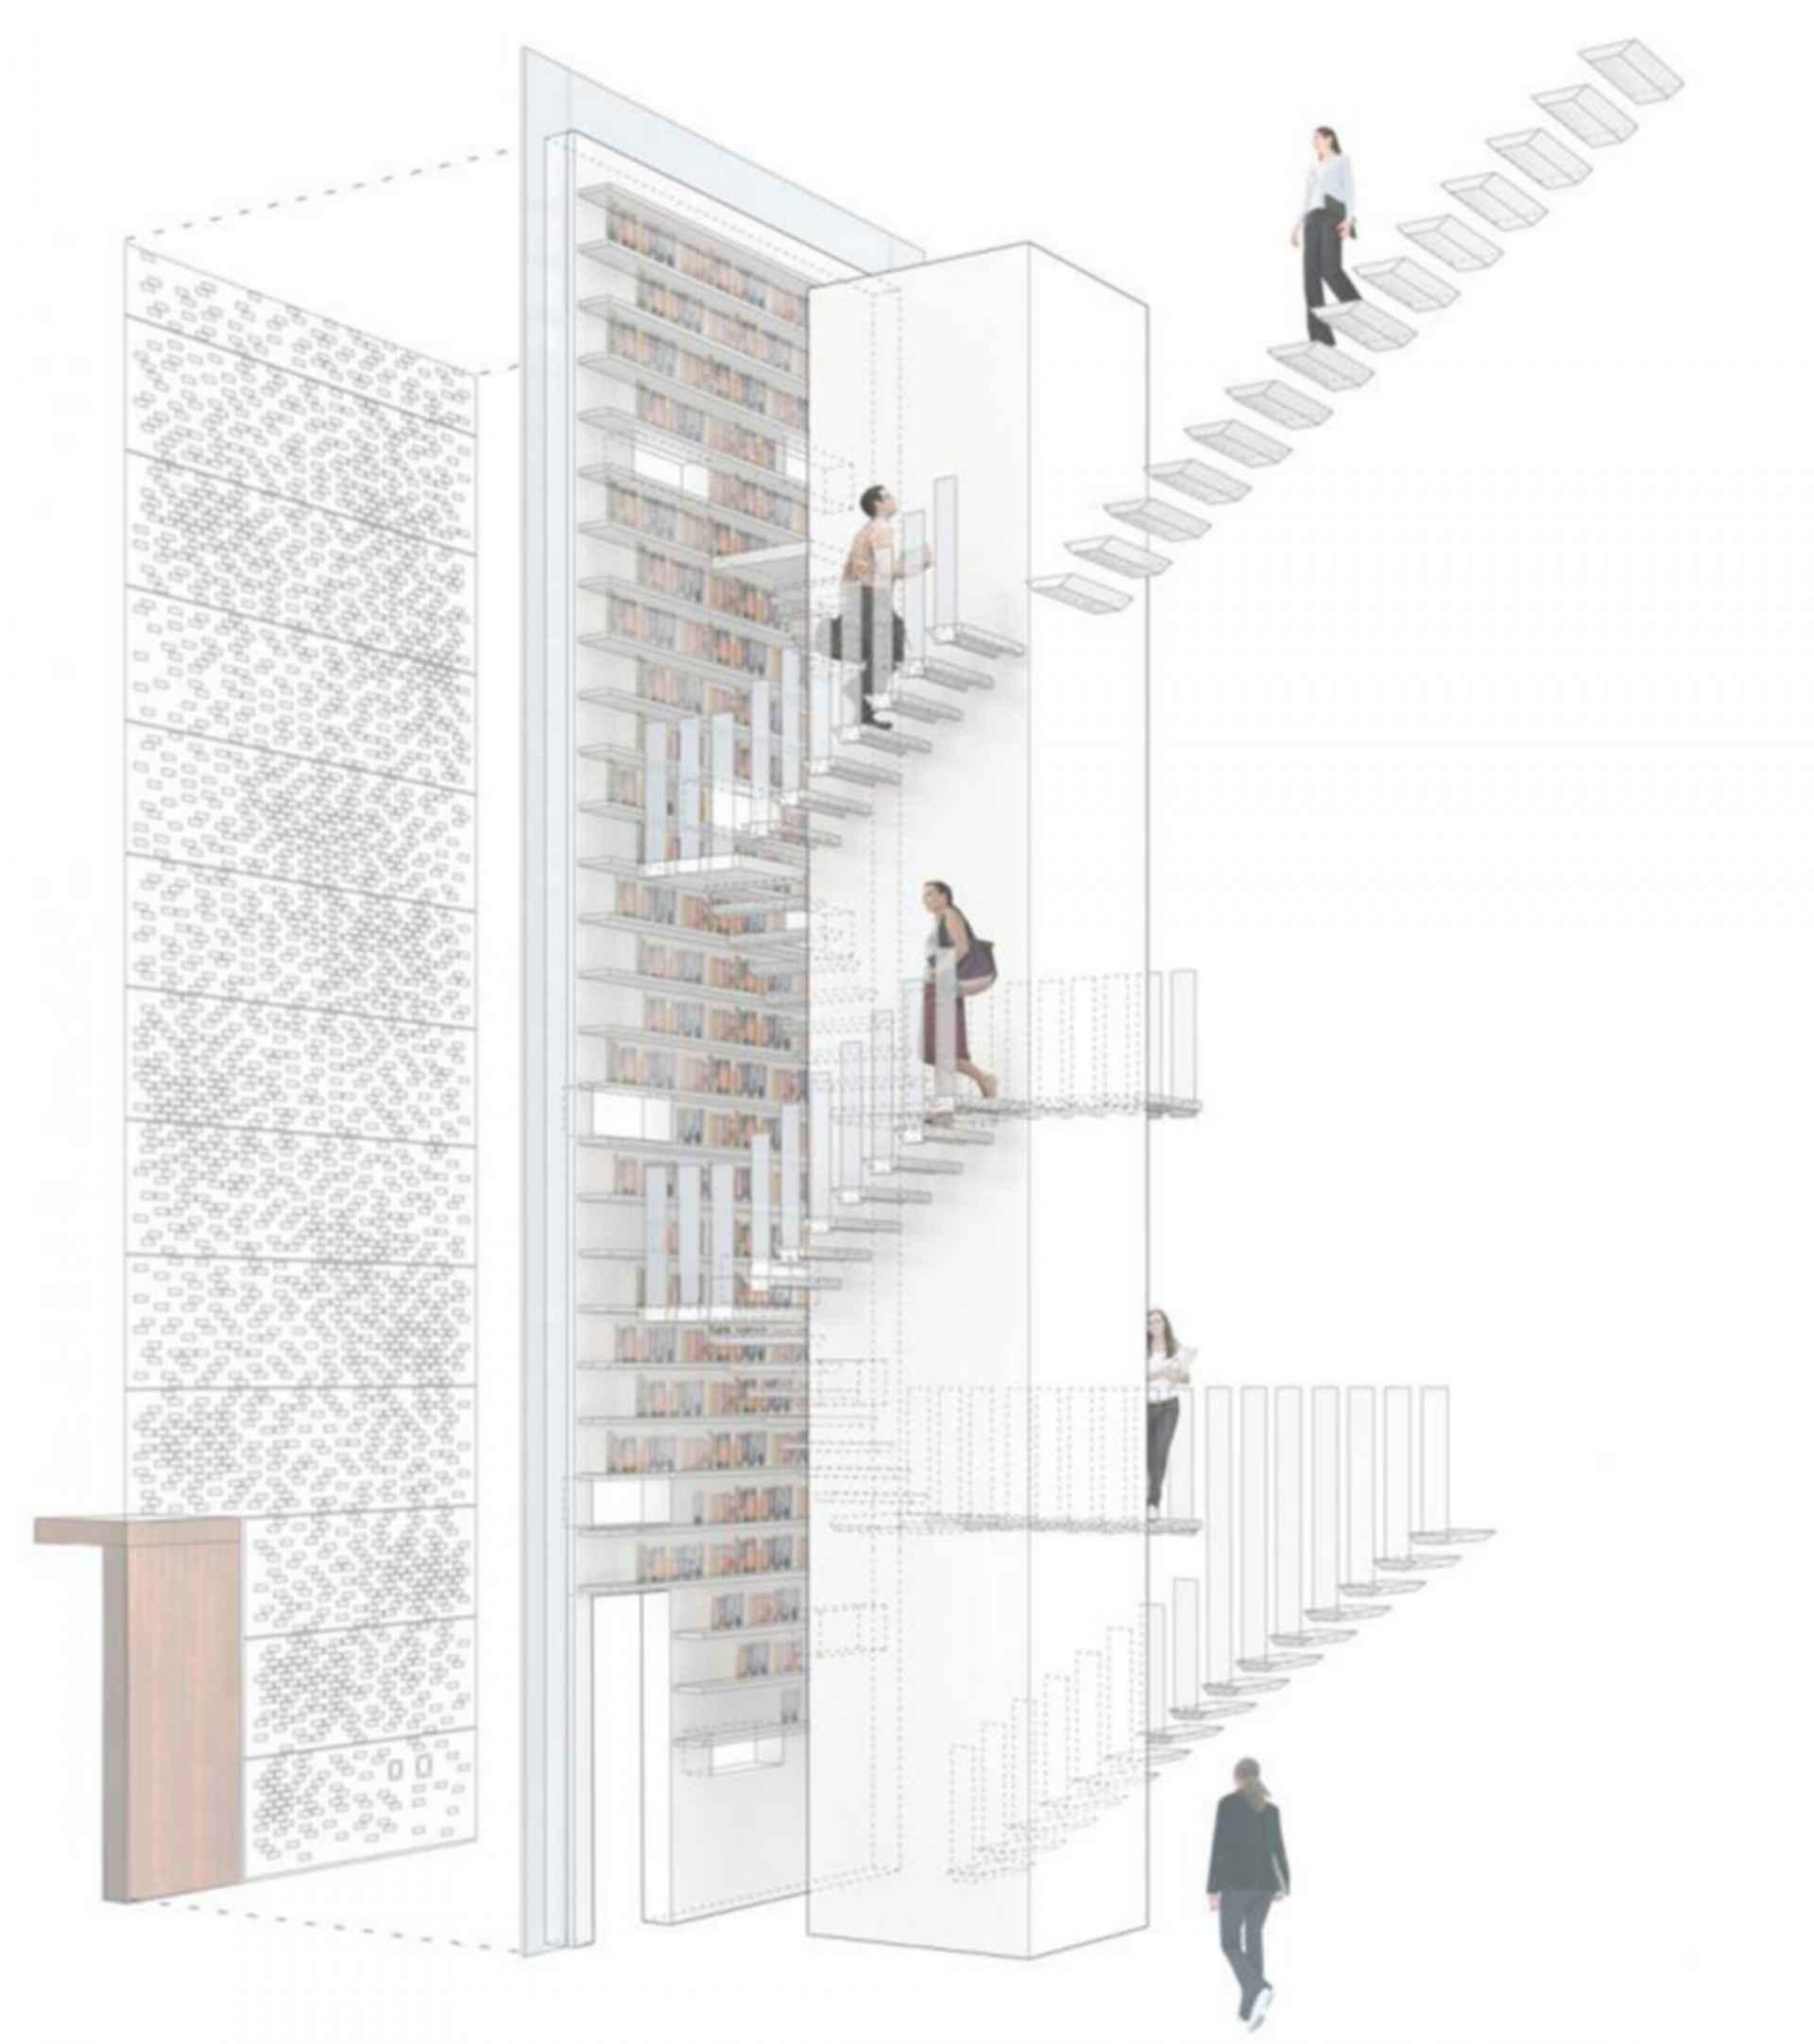 Urban Townhouse Floor Plan